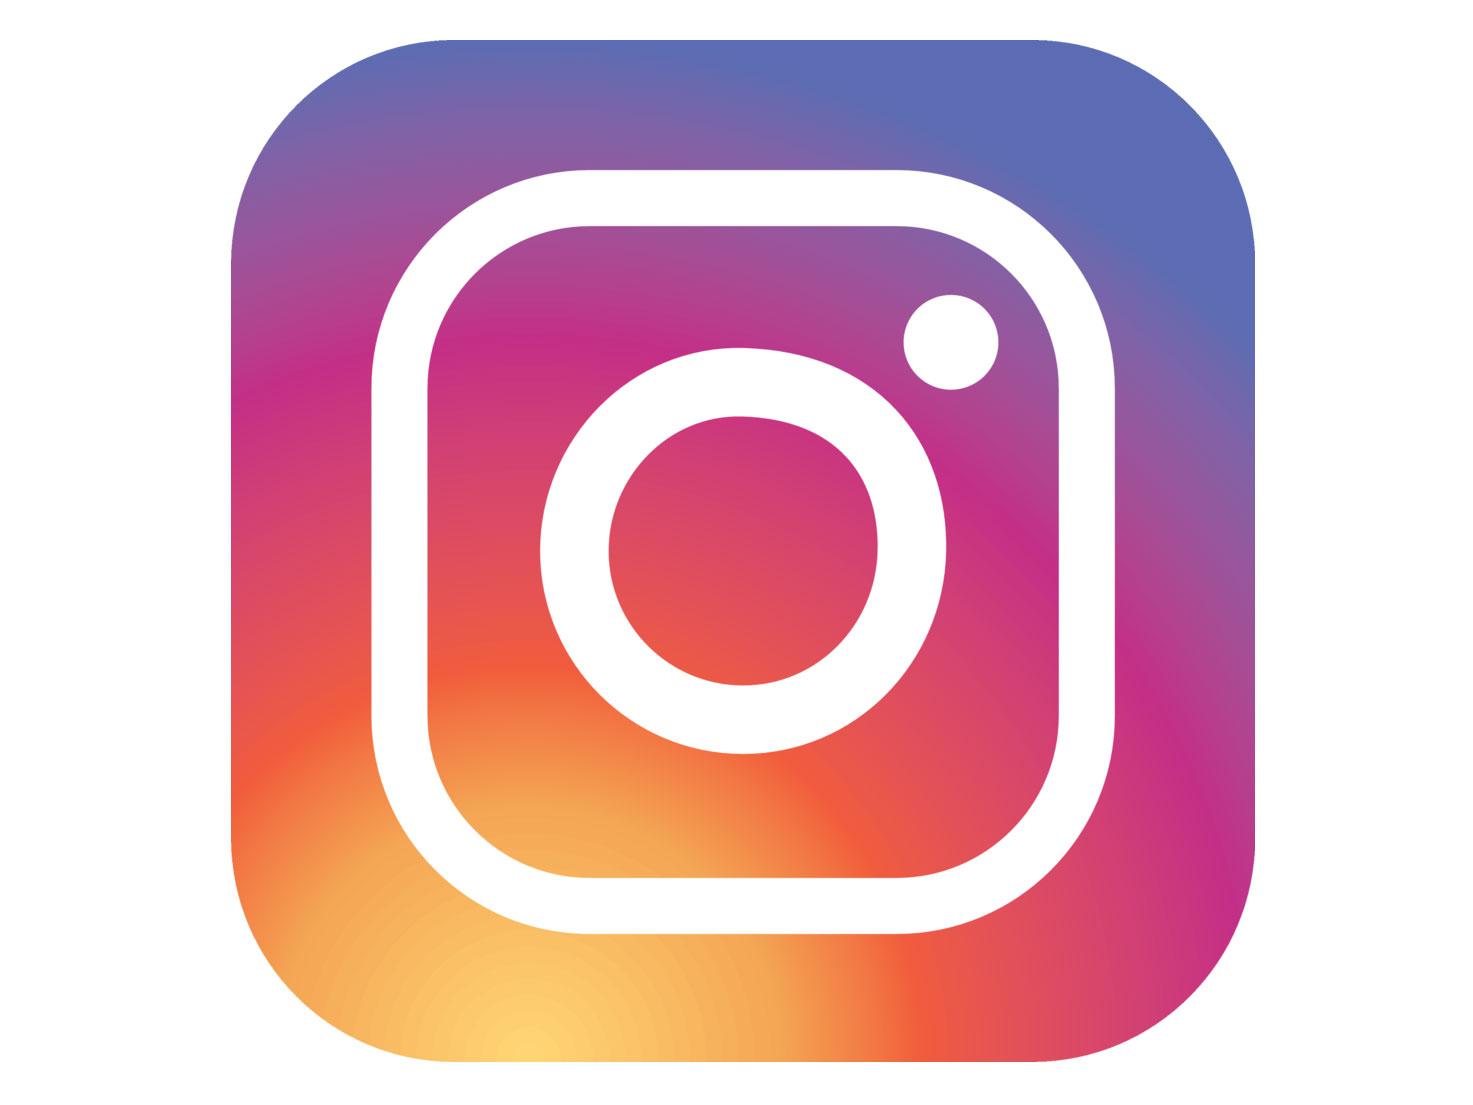 Instagram clipart image clip black and white stock 92+ Instagram Clipart   ClipartLook clip black and white stock